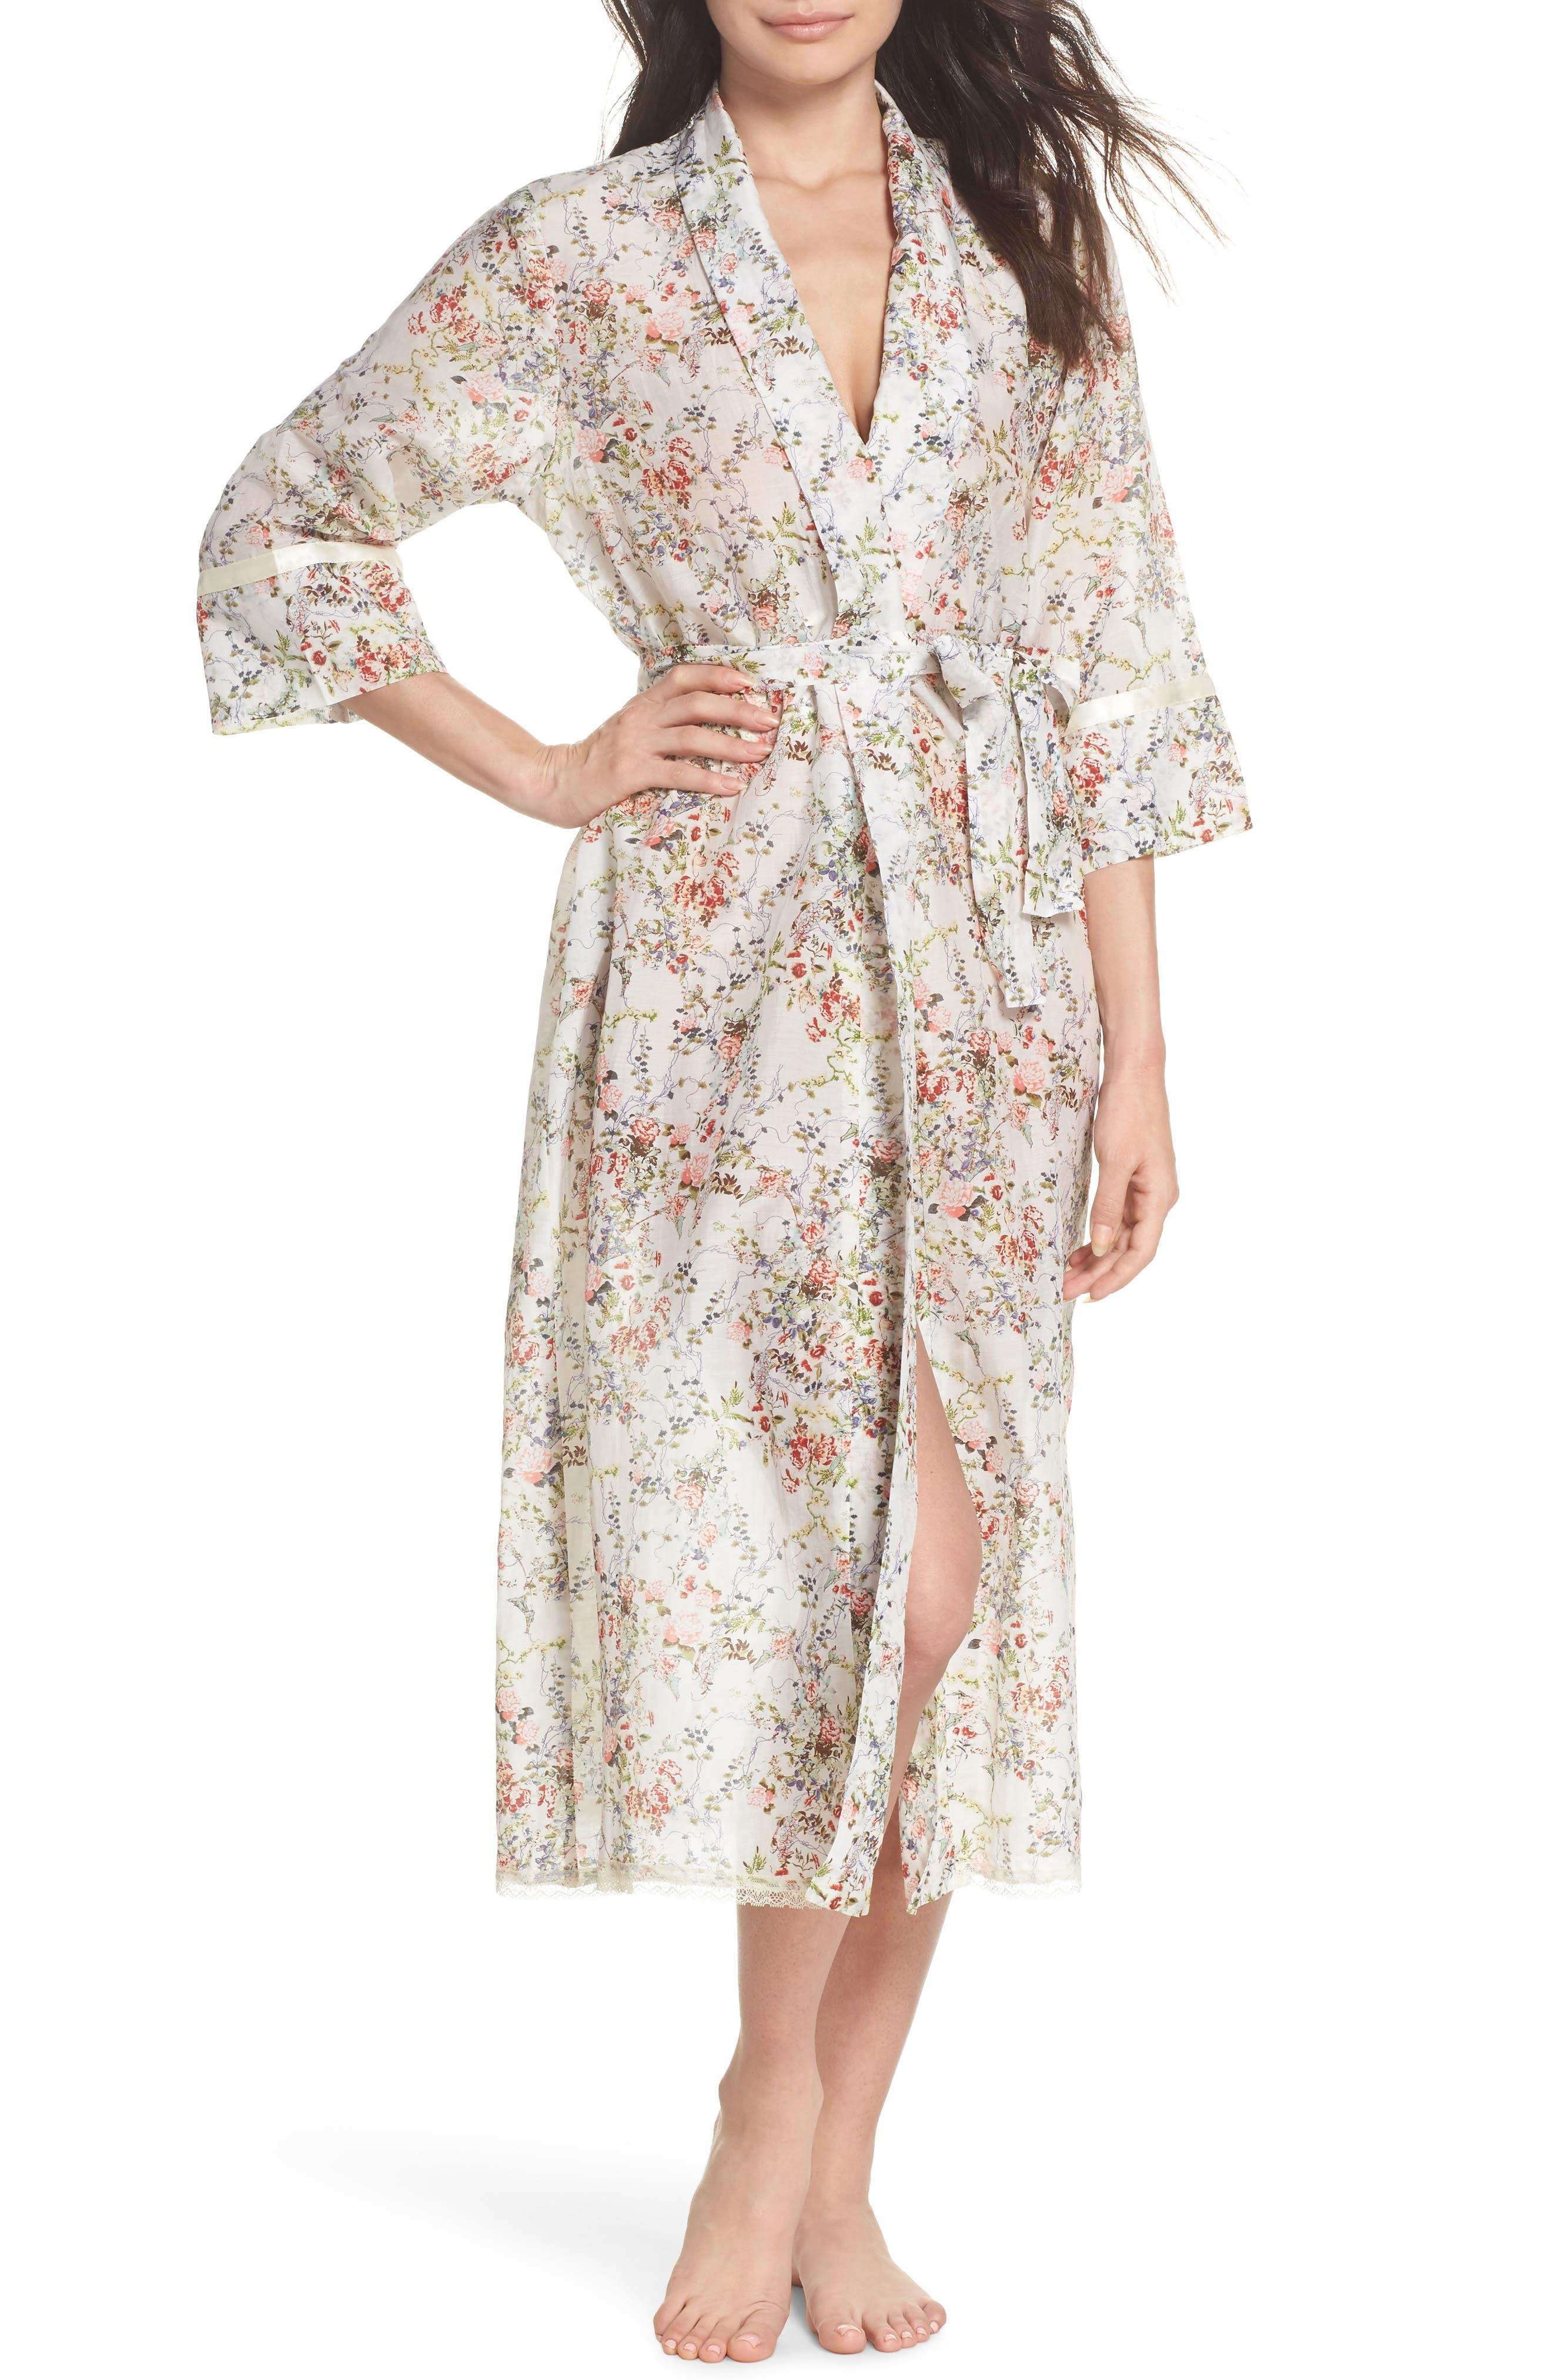 Yolly Floral Cotton & Silk Robe,                             Main thumbnail 1, color,                             905